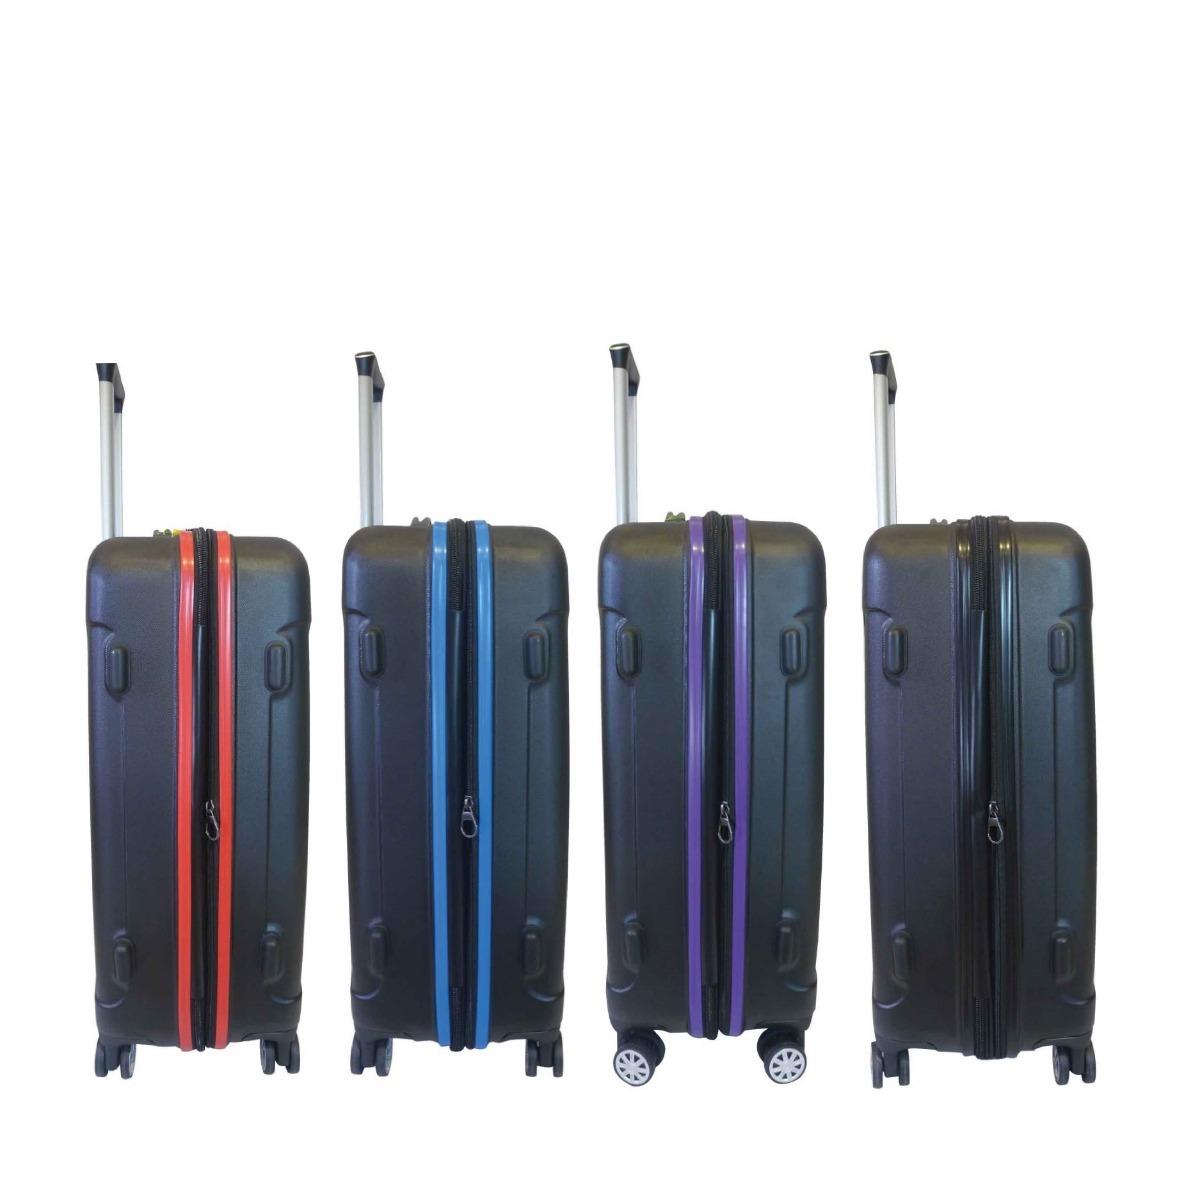 75a7da1c9 set x 3 valijas rigida rueda 360 gremond maleta ultraliviana. Cargando zoom.